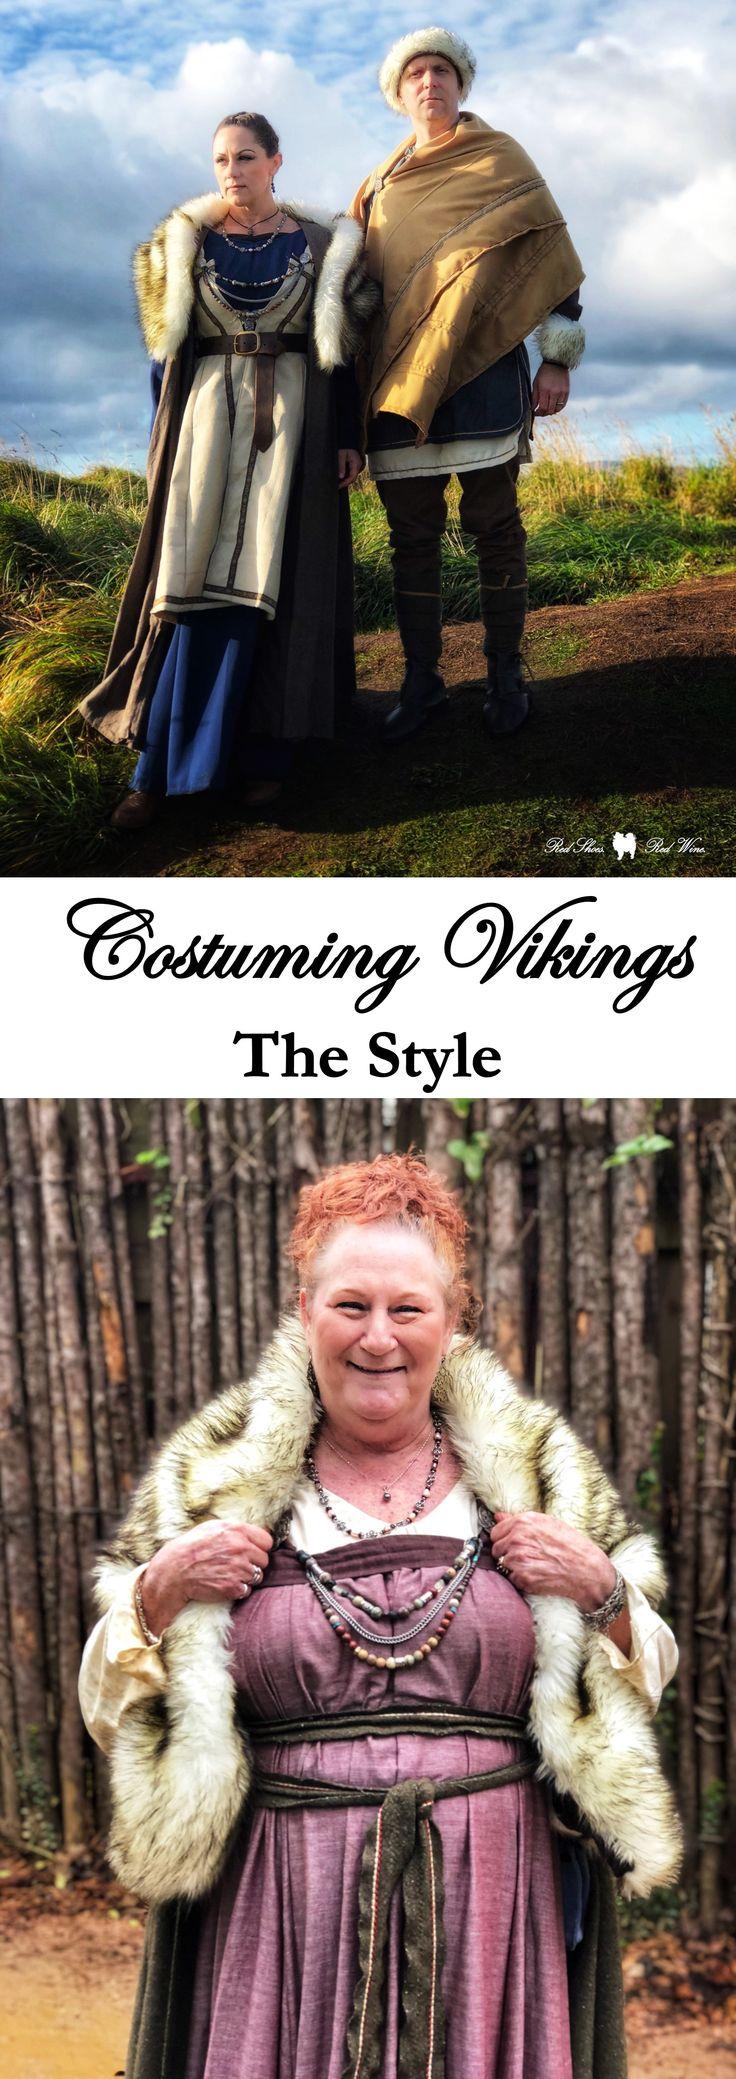 Costuming Vikings: The Style